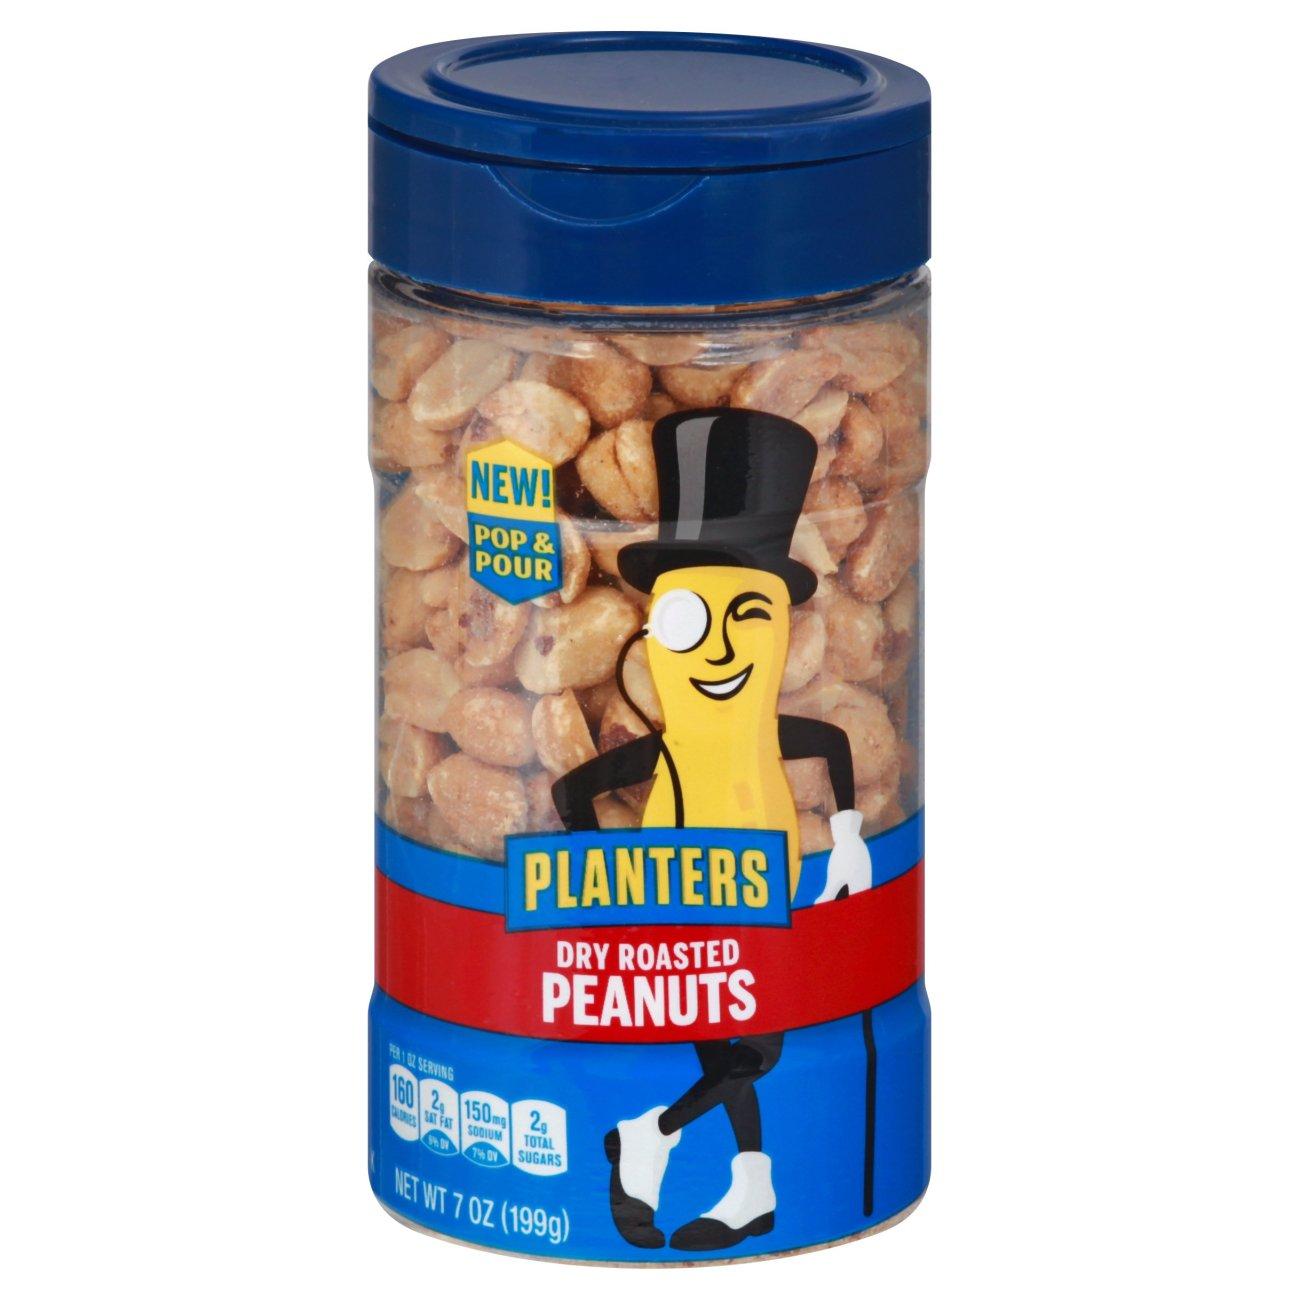 Planters Pop & Pour Dry Roasted Peanuts